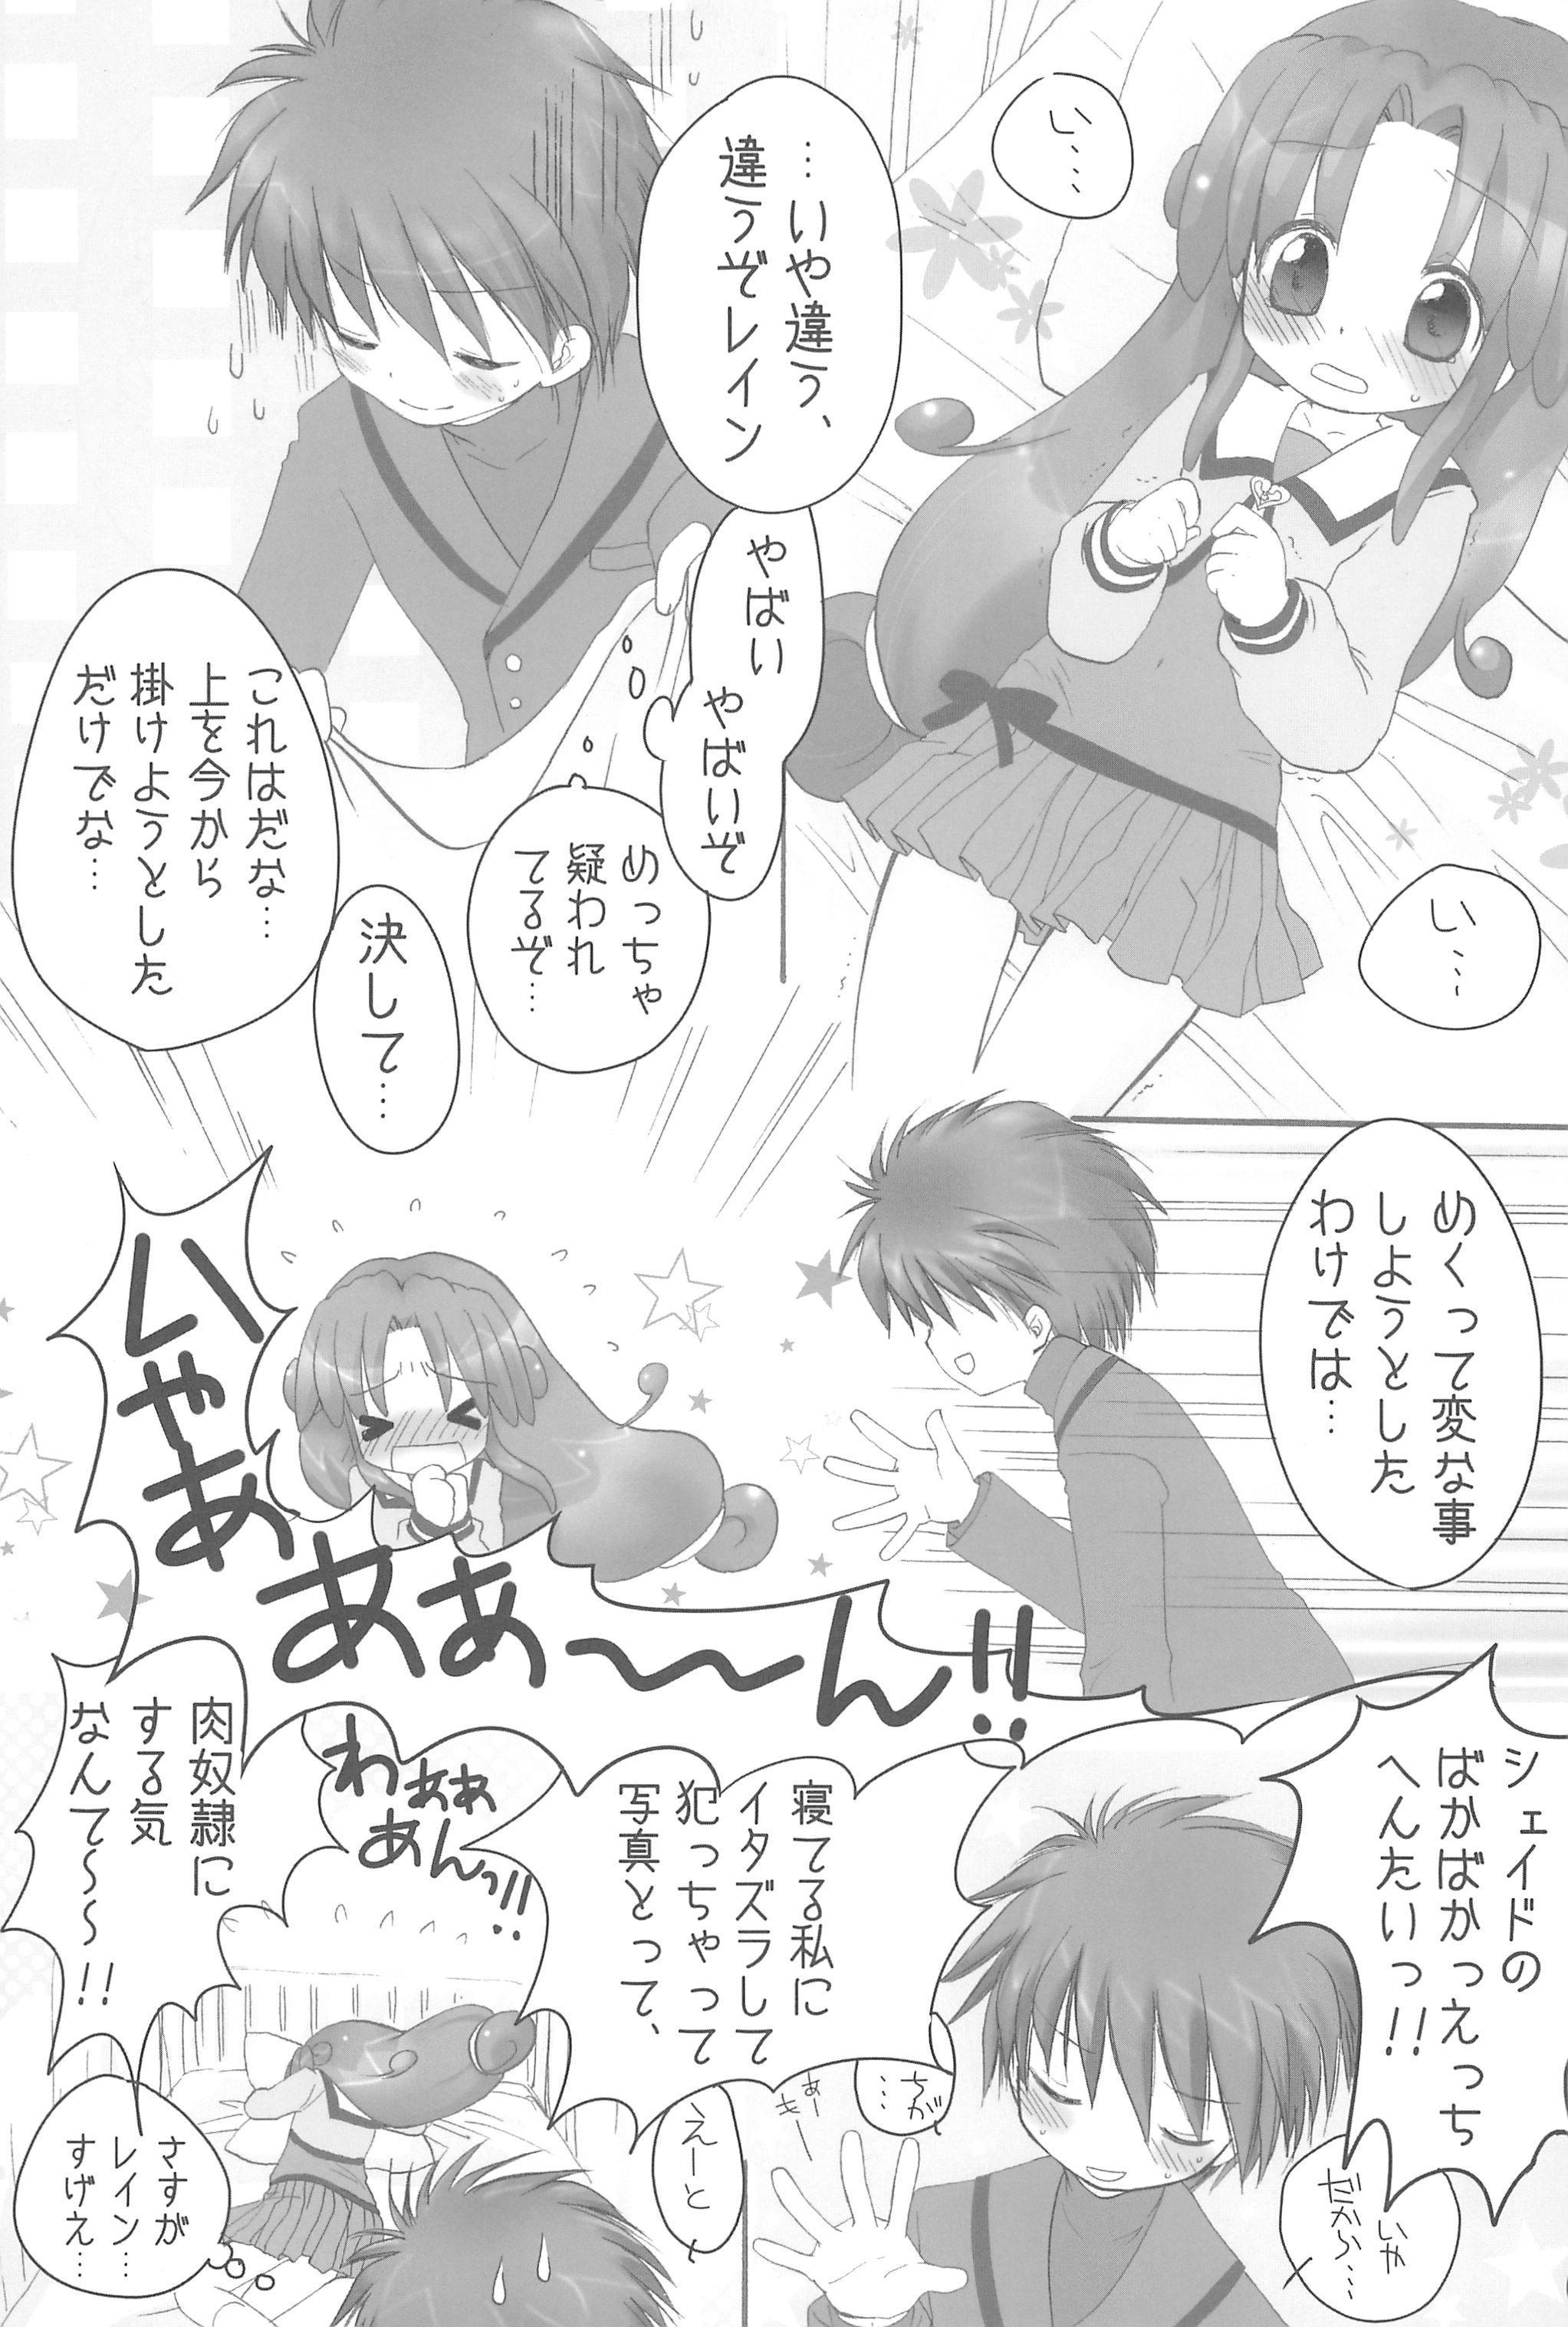 Rein-sama, Goyoujin! 8